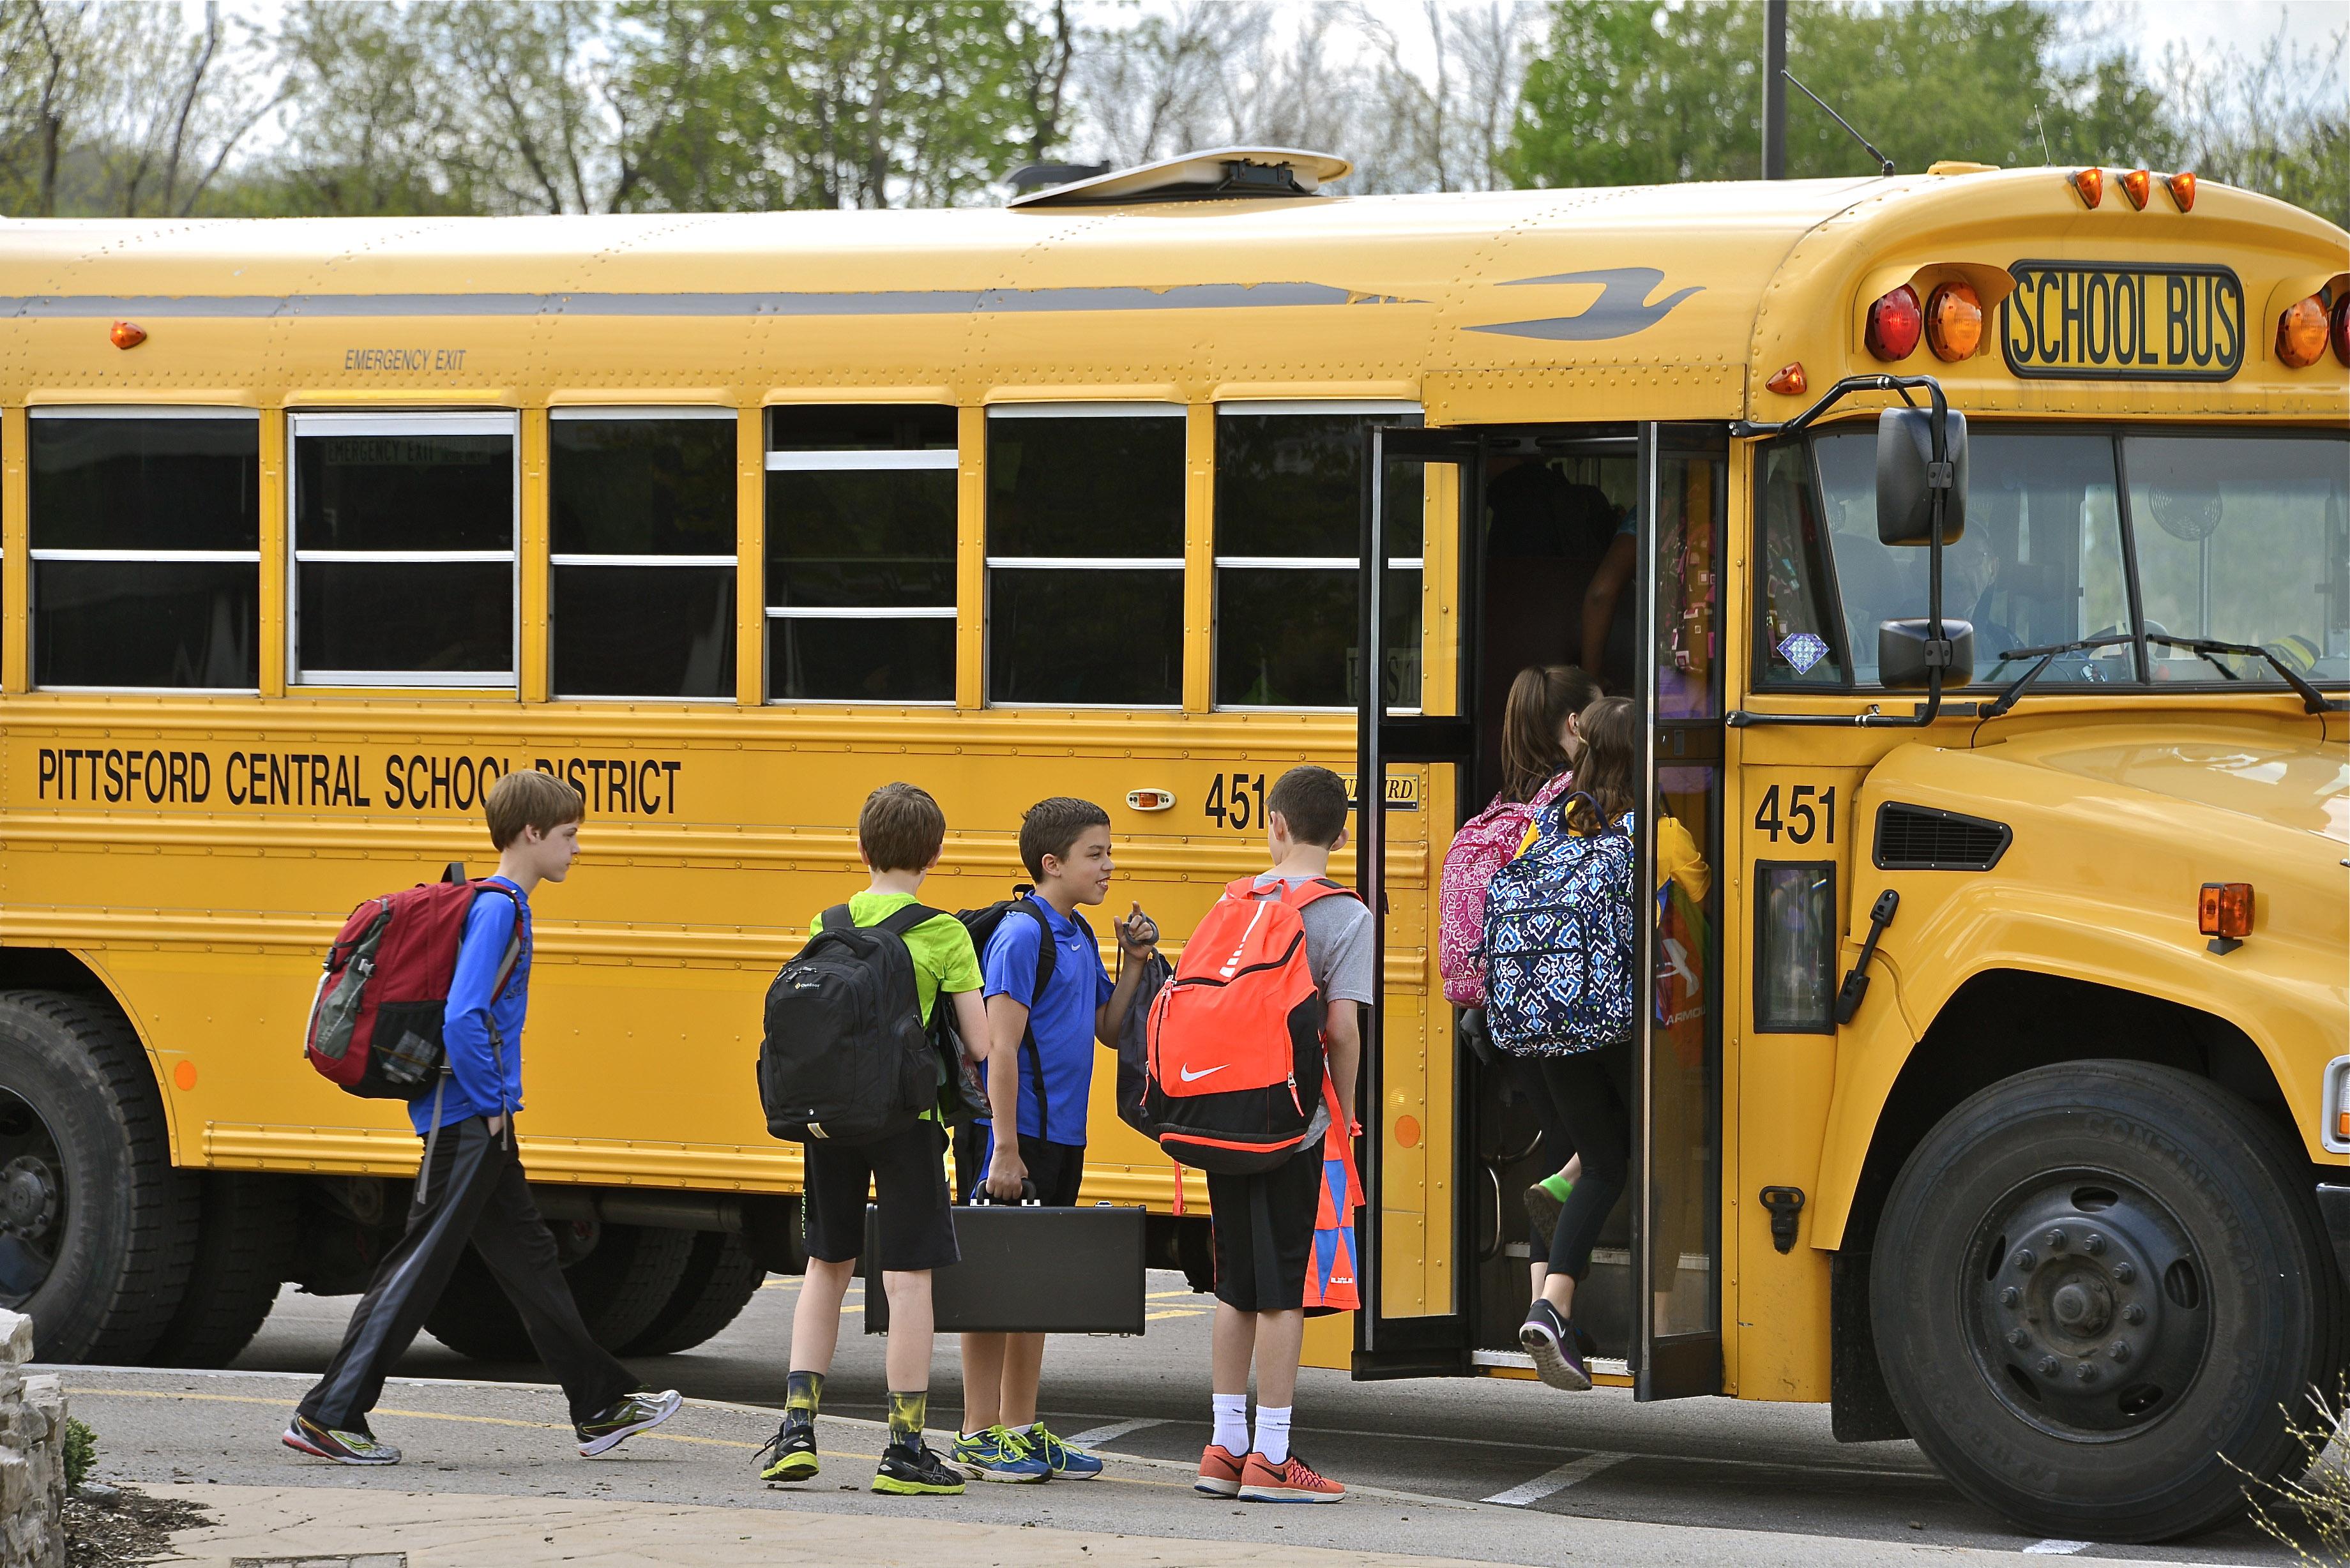 Burger, Robbin / Dismissal Information   Dismissal From School